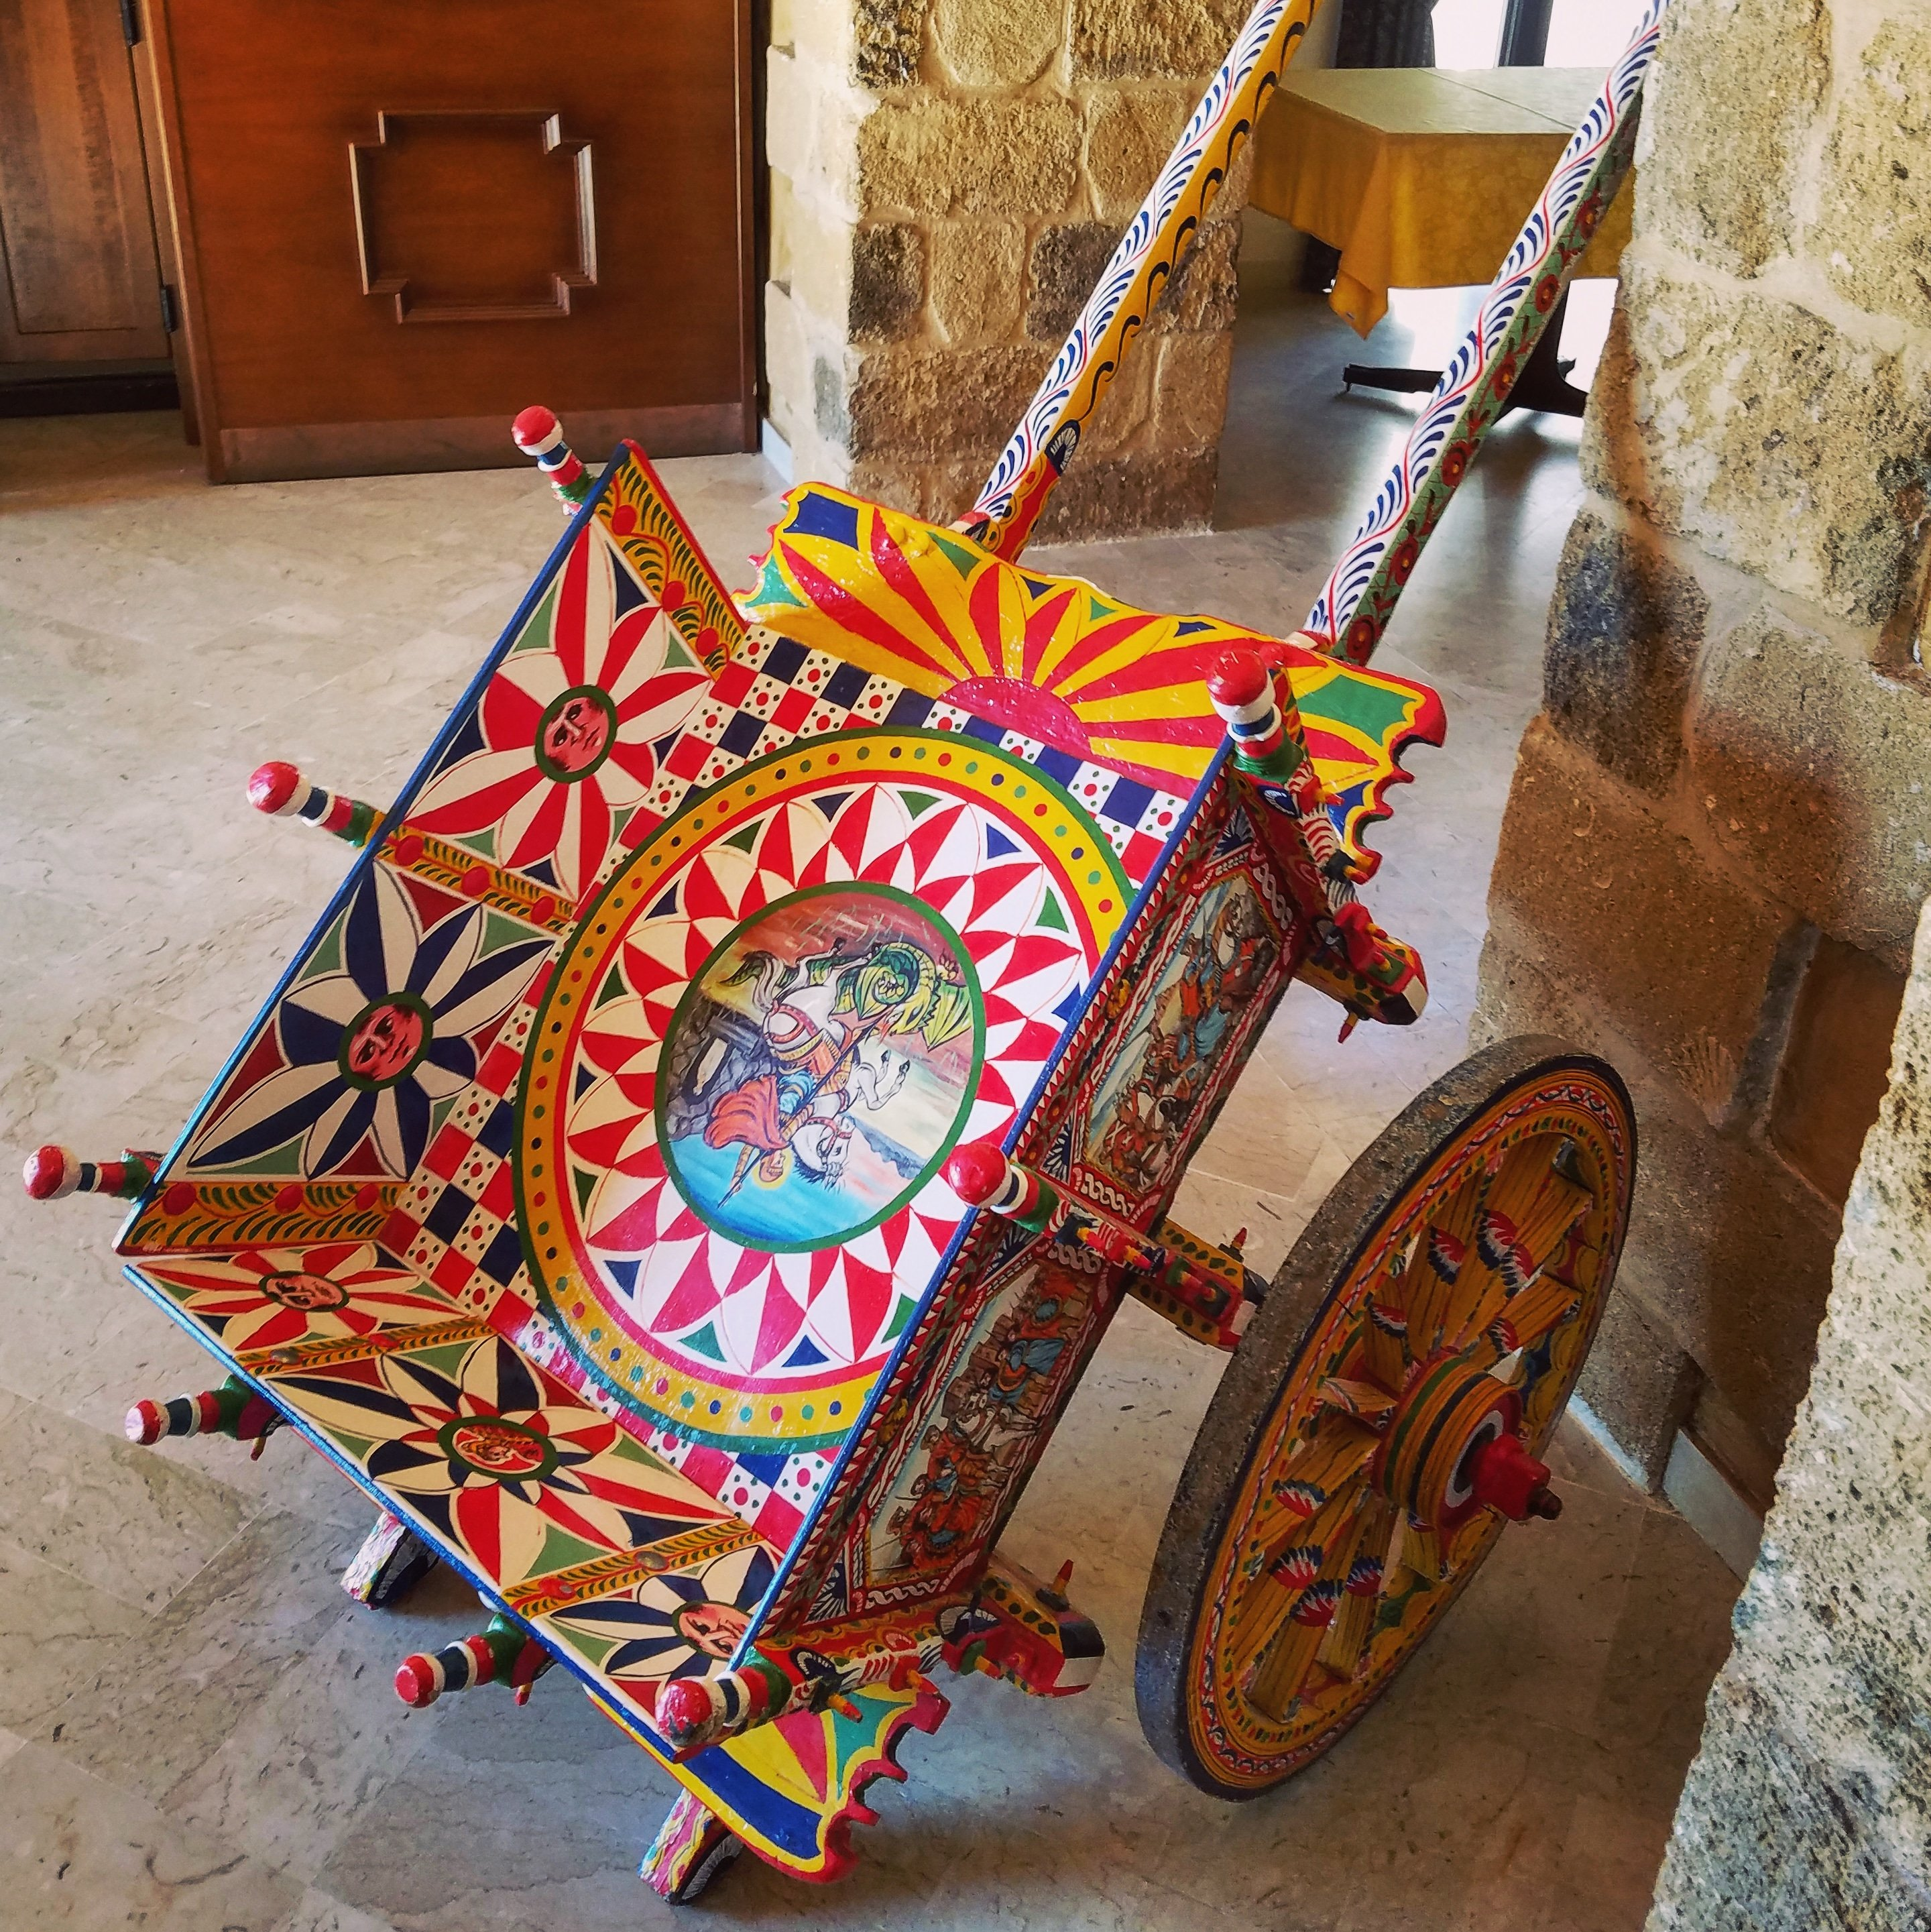 52 Reasons to Love Sicily   #15. Joyful Folk Art